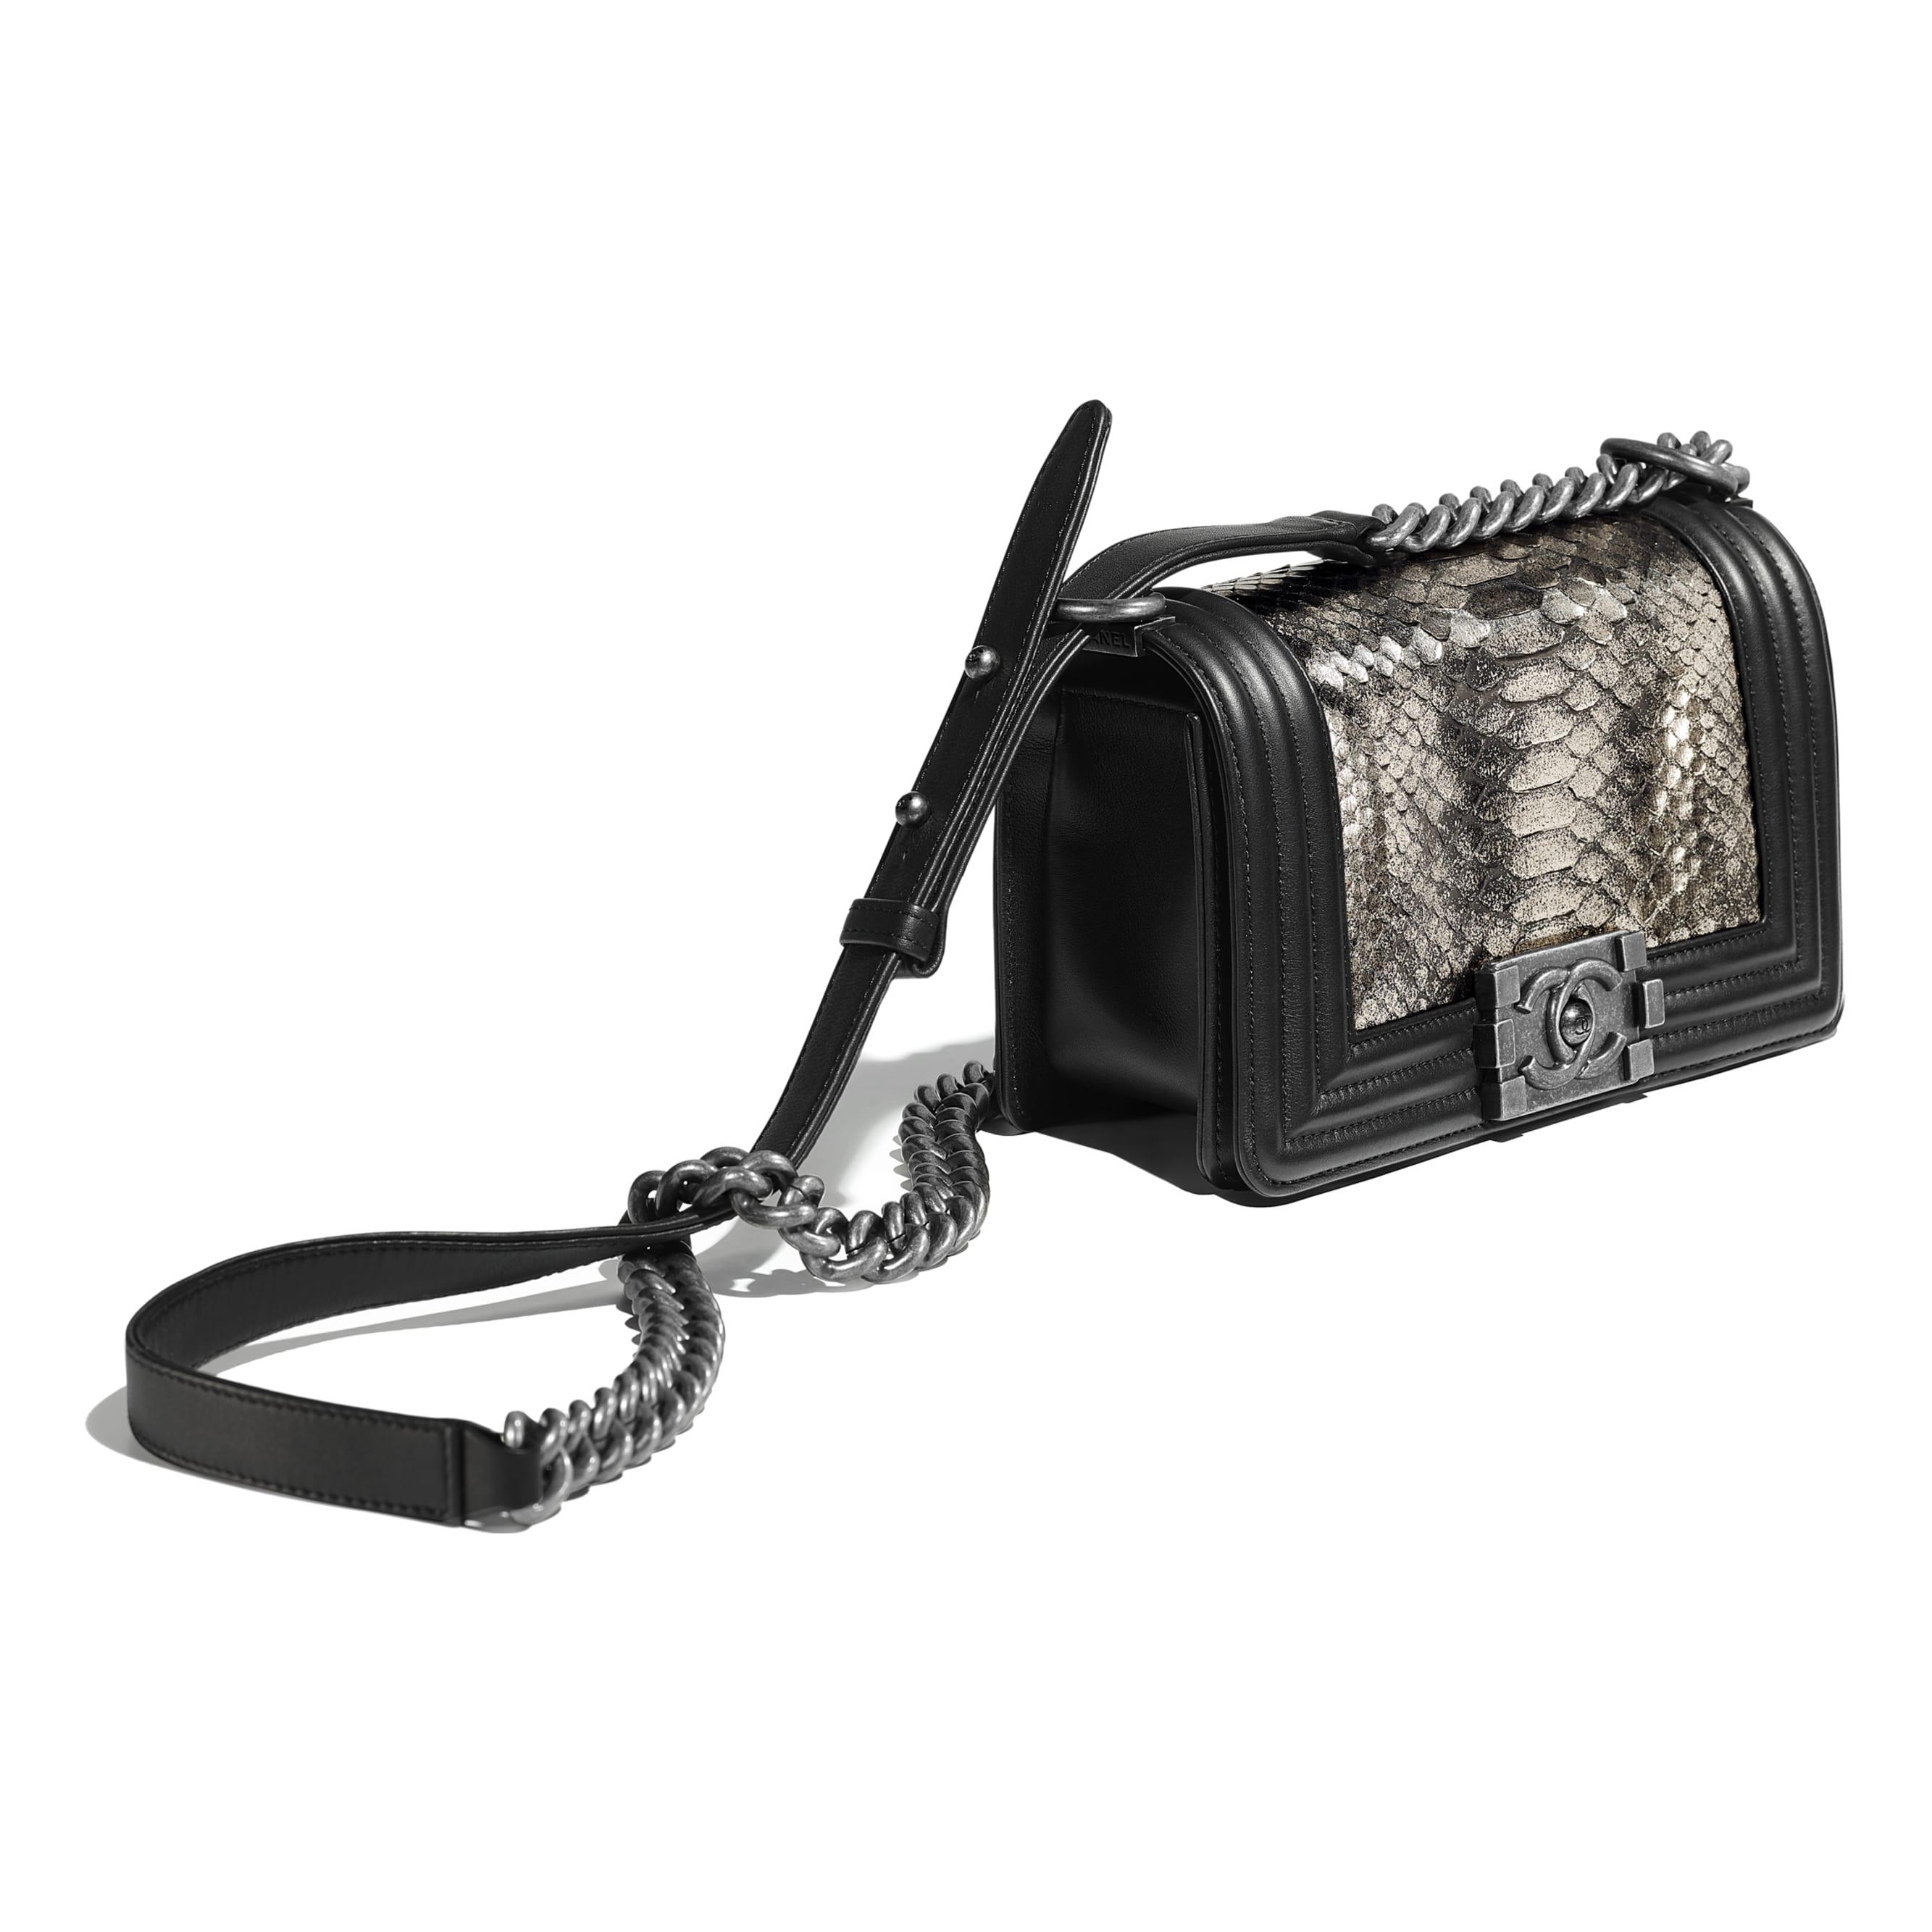 Small BOY CHANEL Handbag - Silver & Black - python, calfskin & ruthenium-finish metal - Other view - see standard sized version